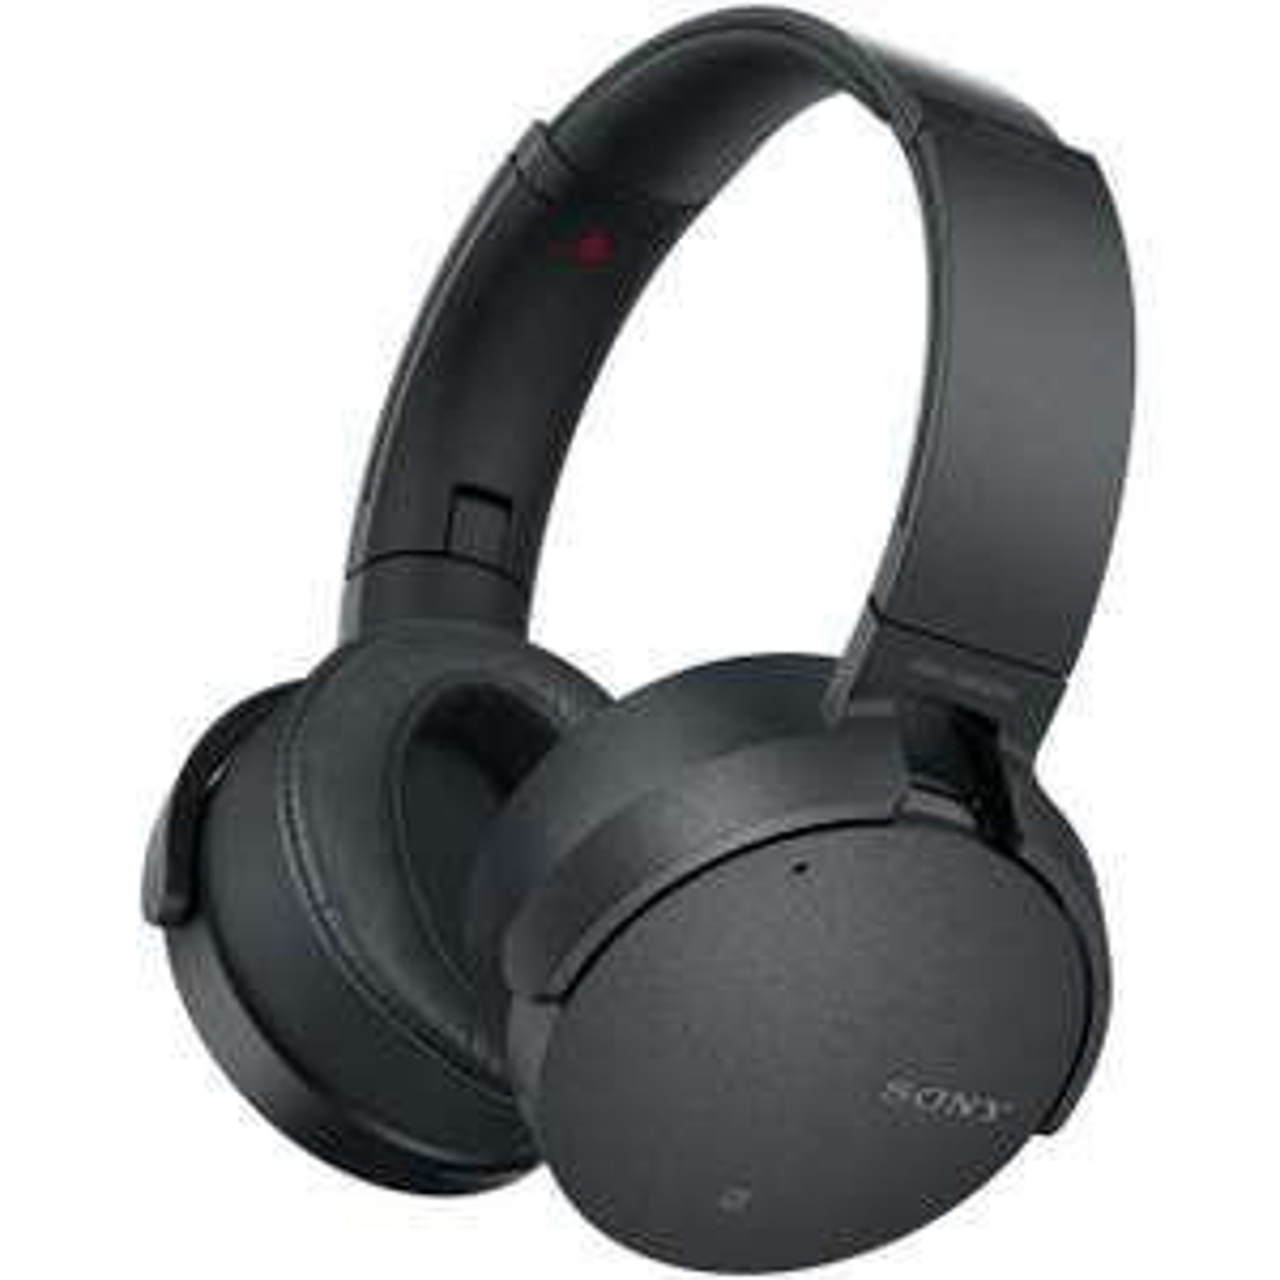 Sony MDRXB950N1B Over-Ear Wireless Headphones (Black) - £84.87 @ Amazon